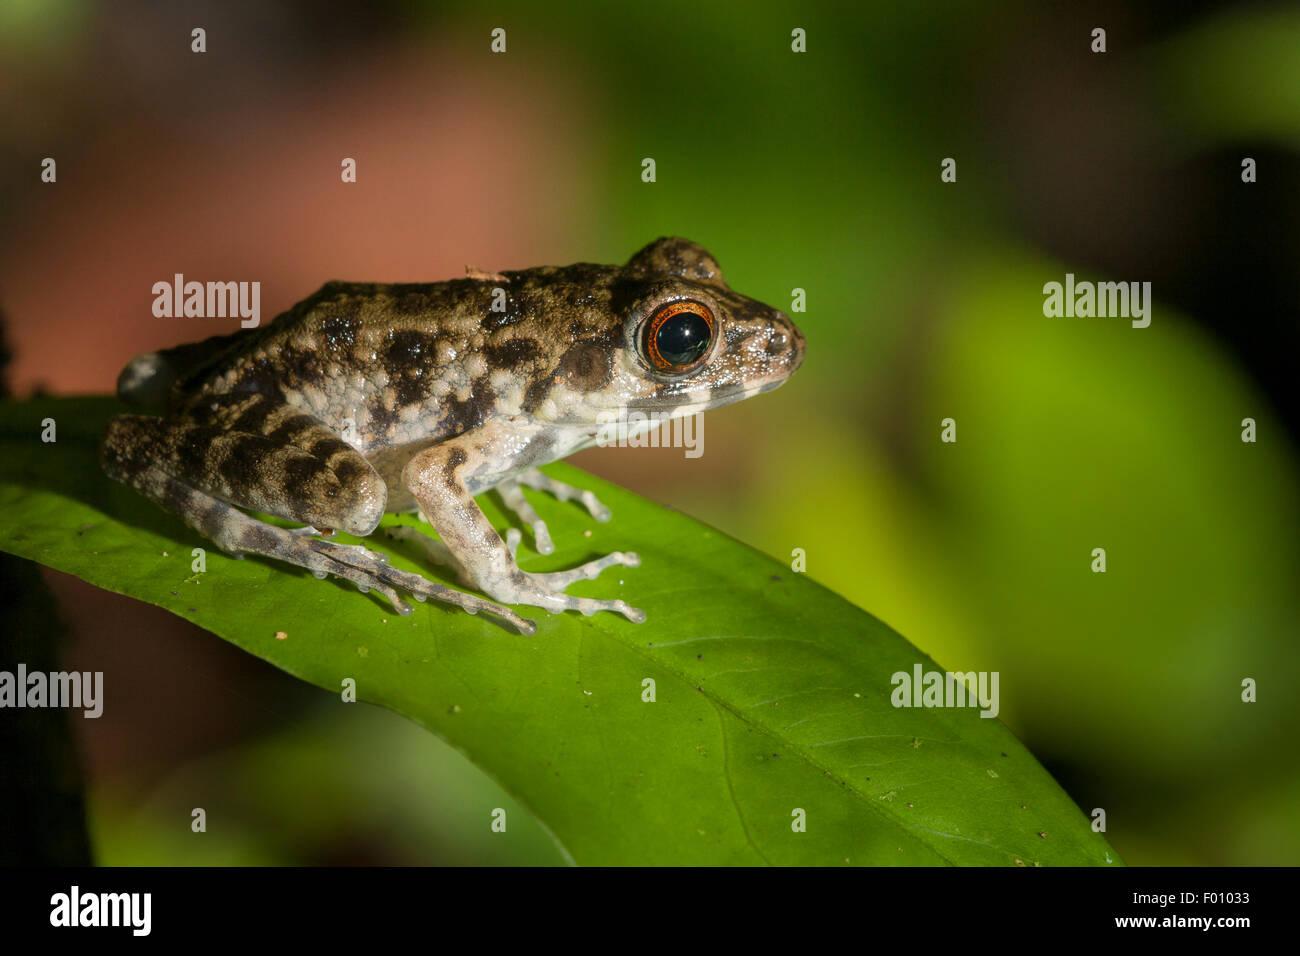 Rough-sided frog (Hylarana glandulosa) on a leaf. - Stock Image